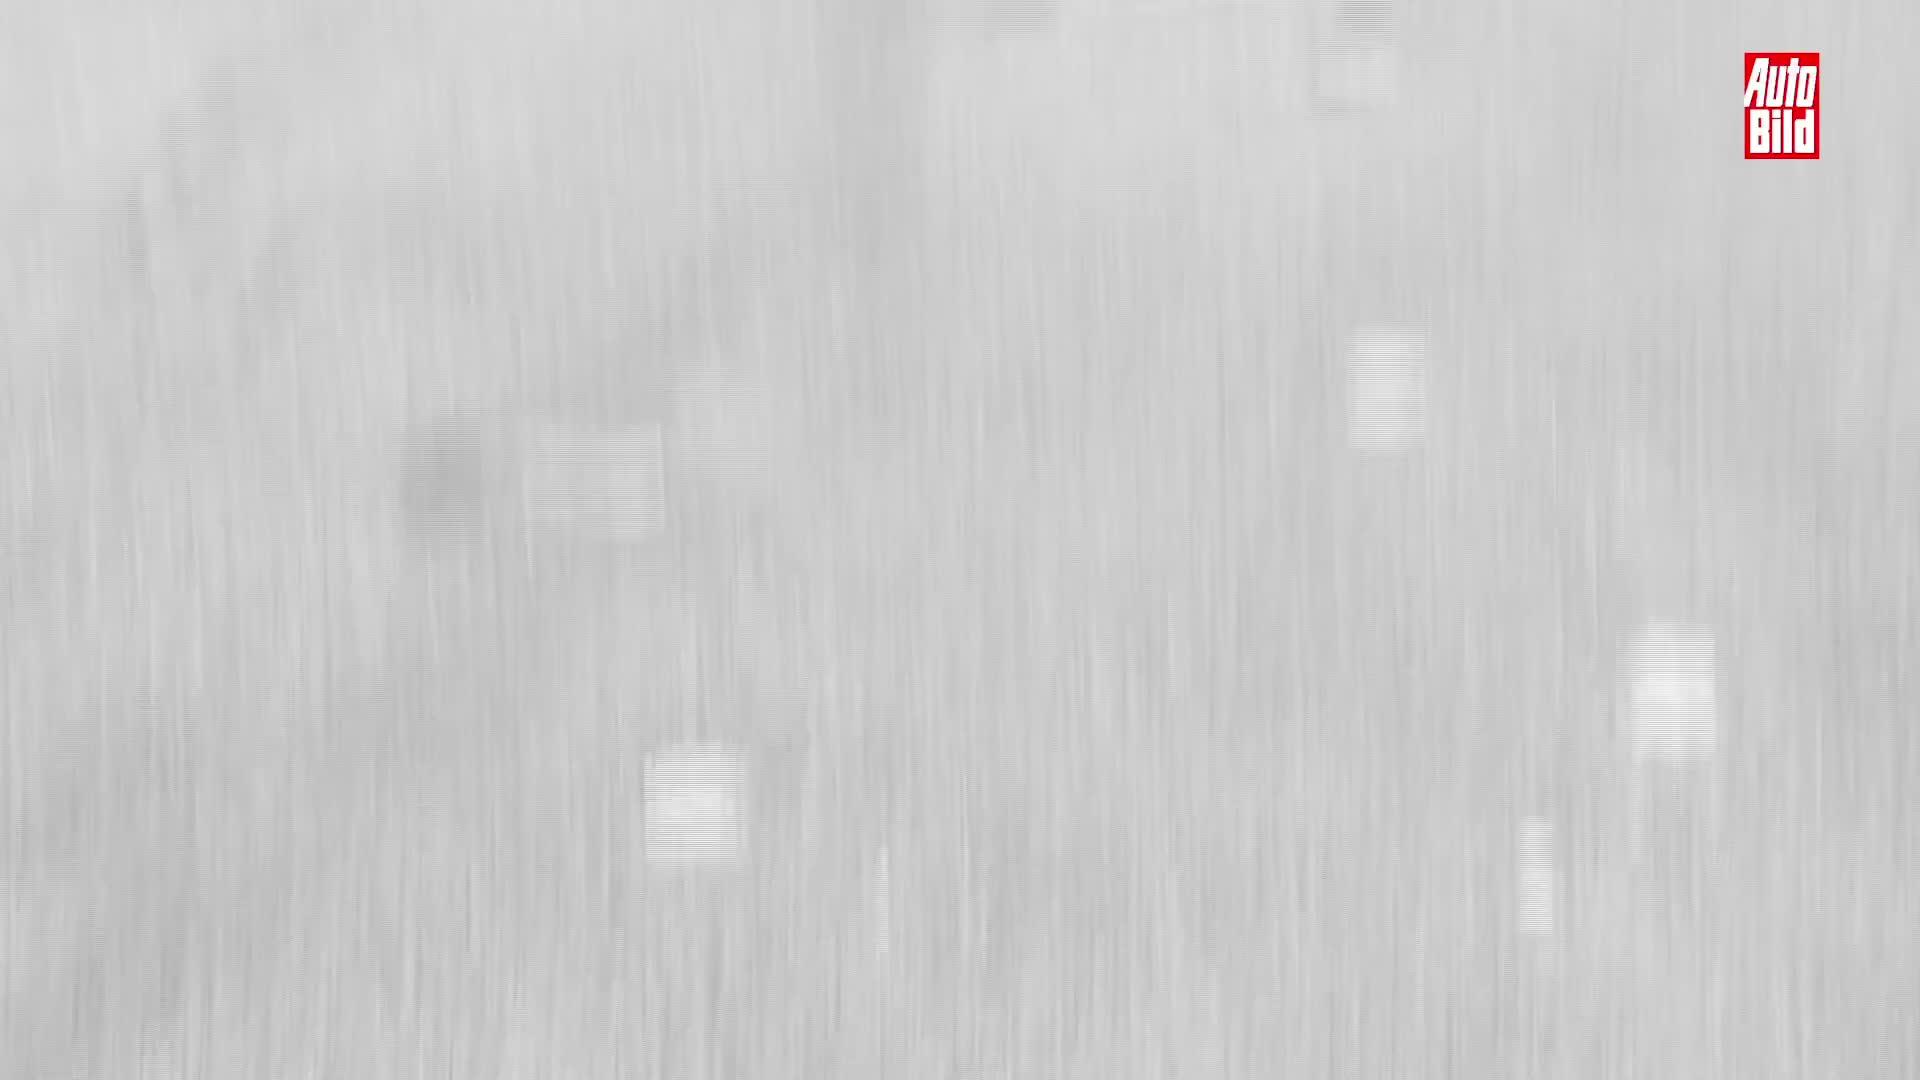 2016, Autos & Vehicles, Crashtest, Ergebnis, Insassen, auto, auto bild, auto bild tv, autobild, autobild tv, baum-unfall, baumcrash, baumunfall, bild, dekra, rash test, test, unfall, Crashtest Baum-Unfall - Schockierendes Ergebnis GIFs